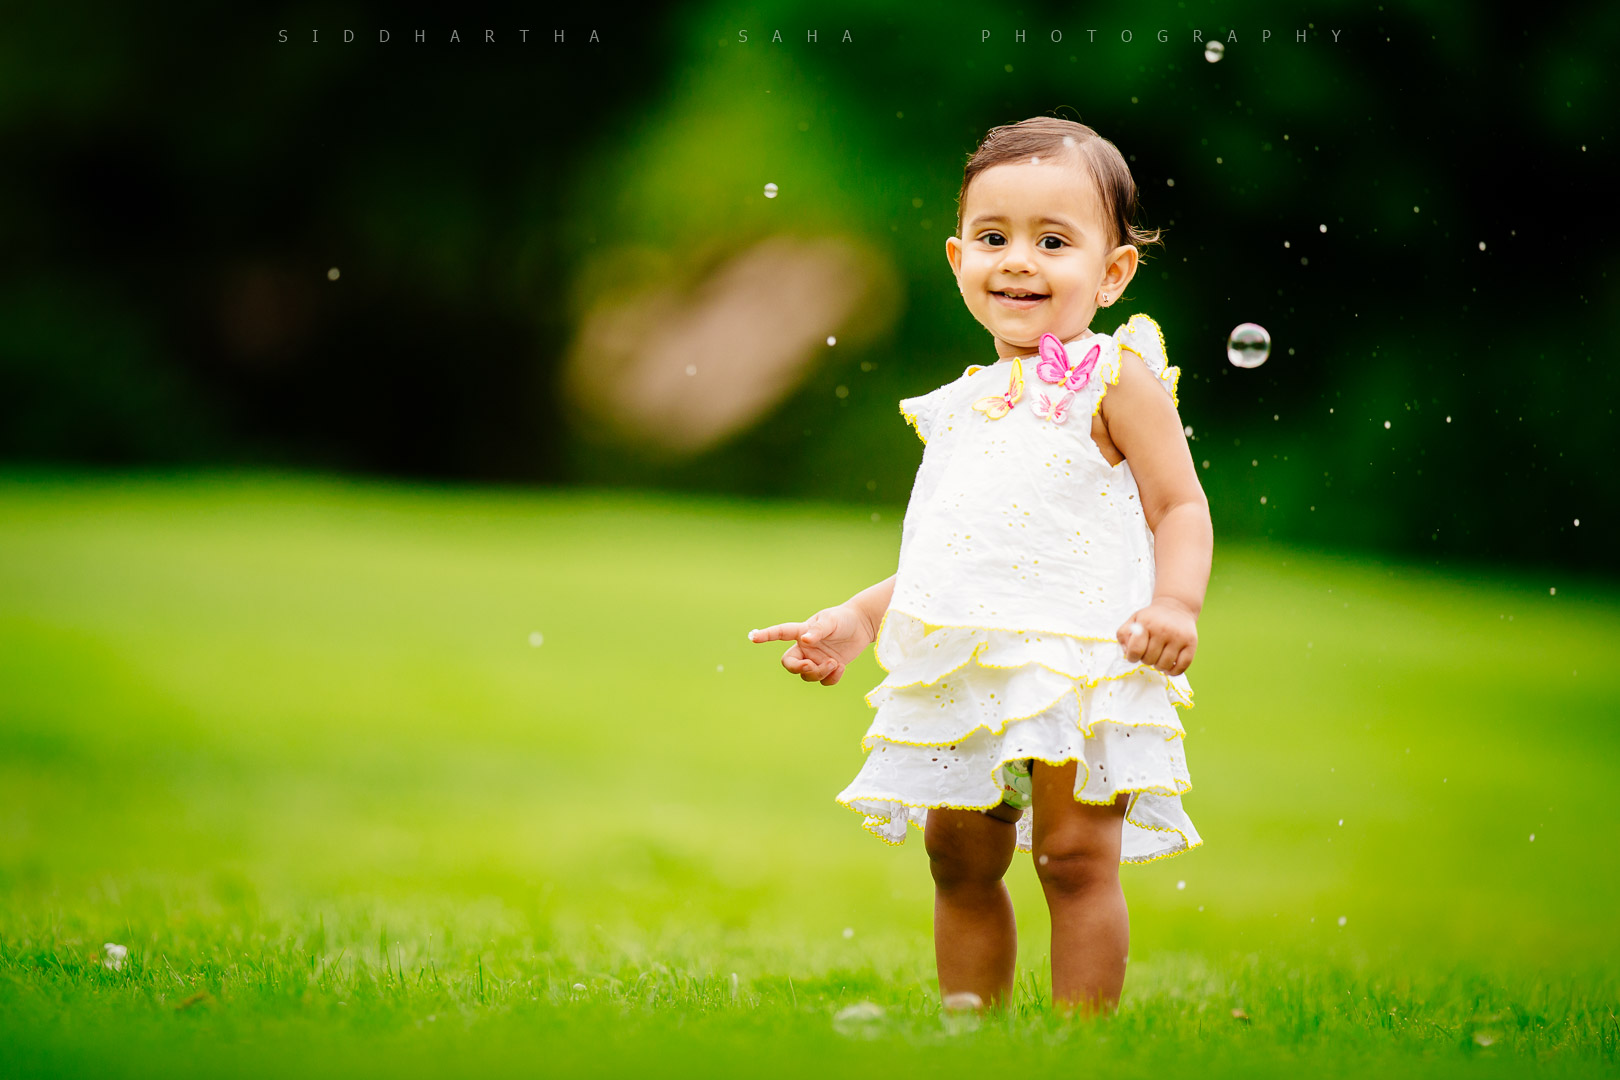 2015-08-08 - Padmaja Ketan Family Photoshoot - _05Y8070